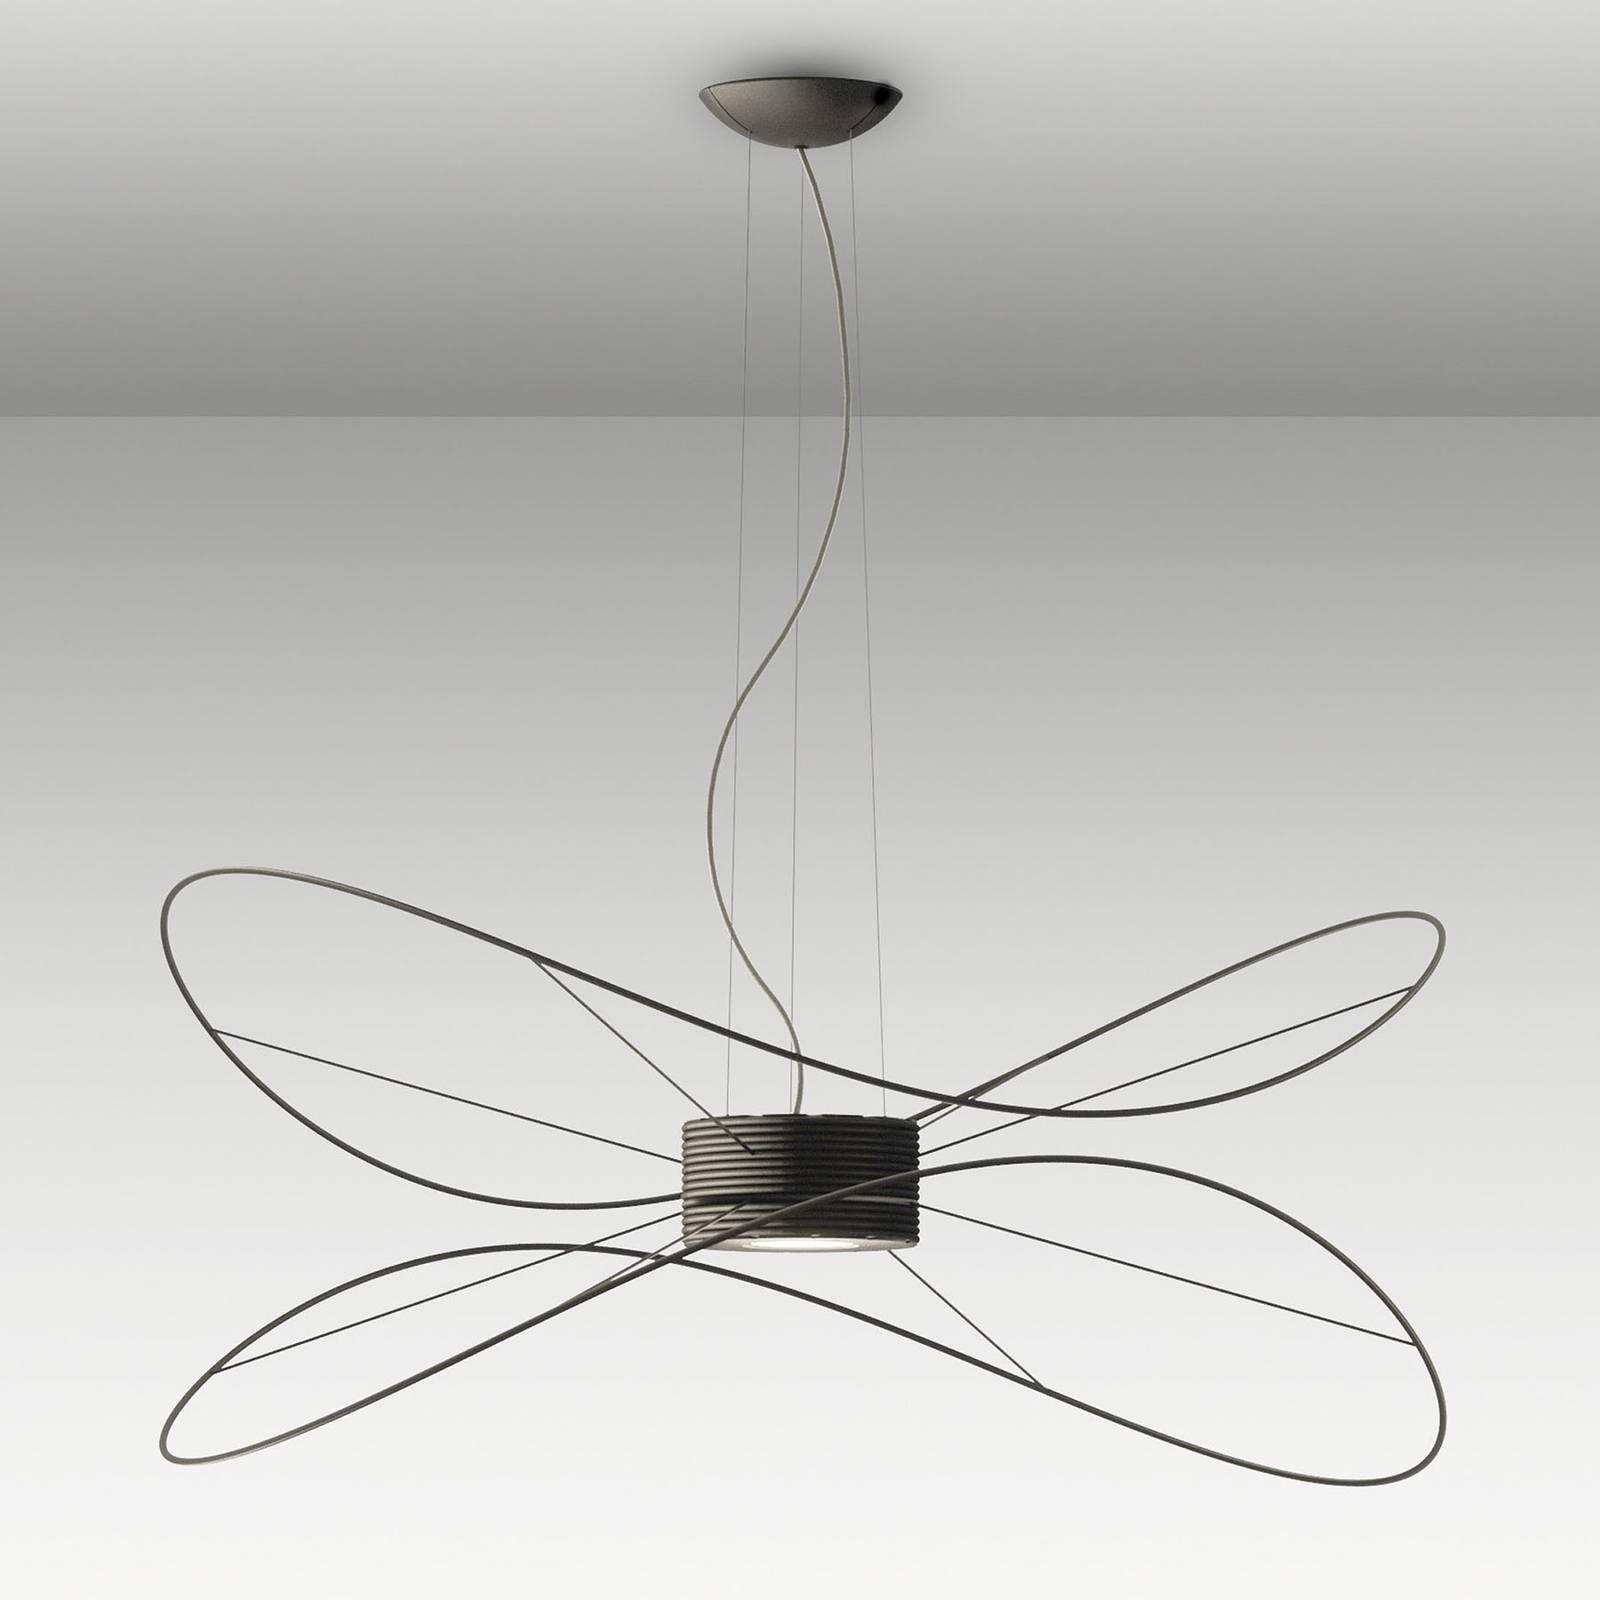 Axolight Hoops 2 lampa wisząca LED, czarna